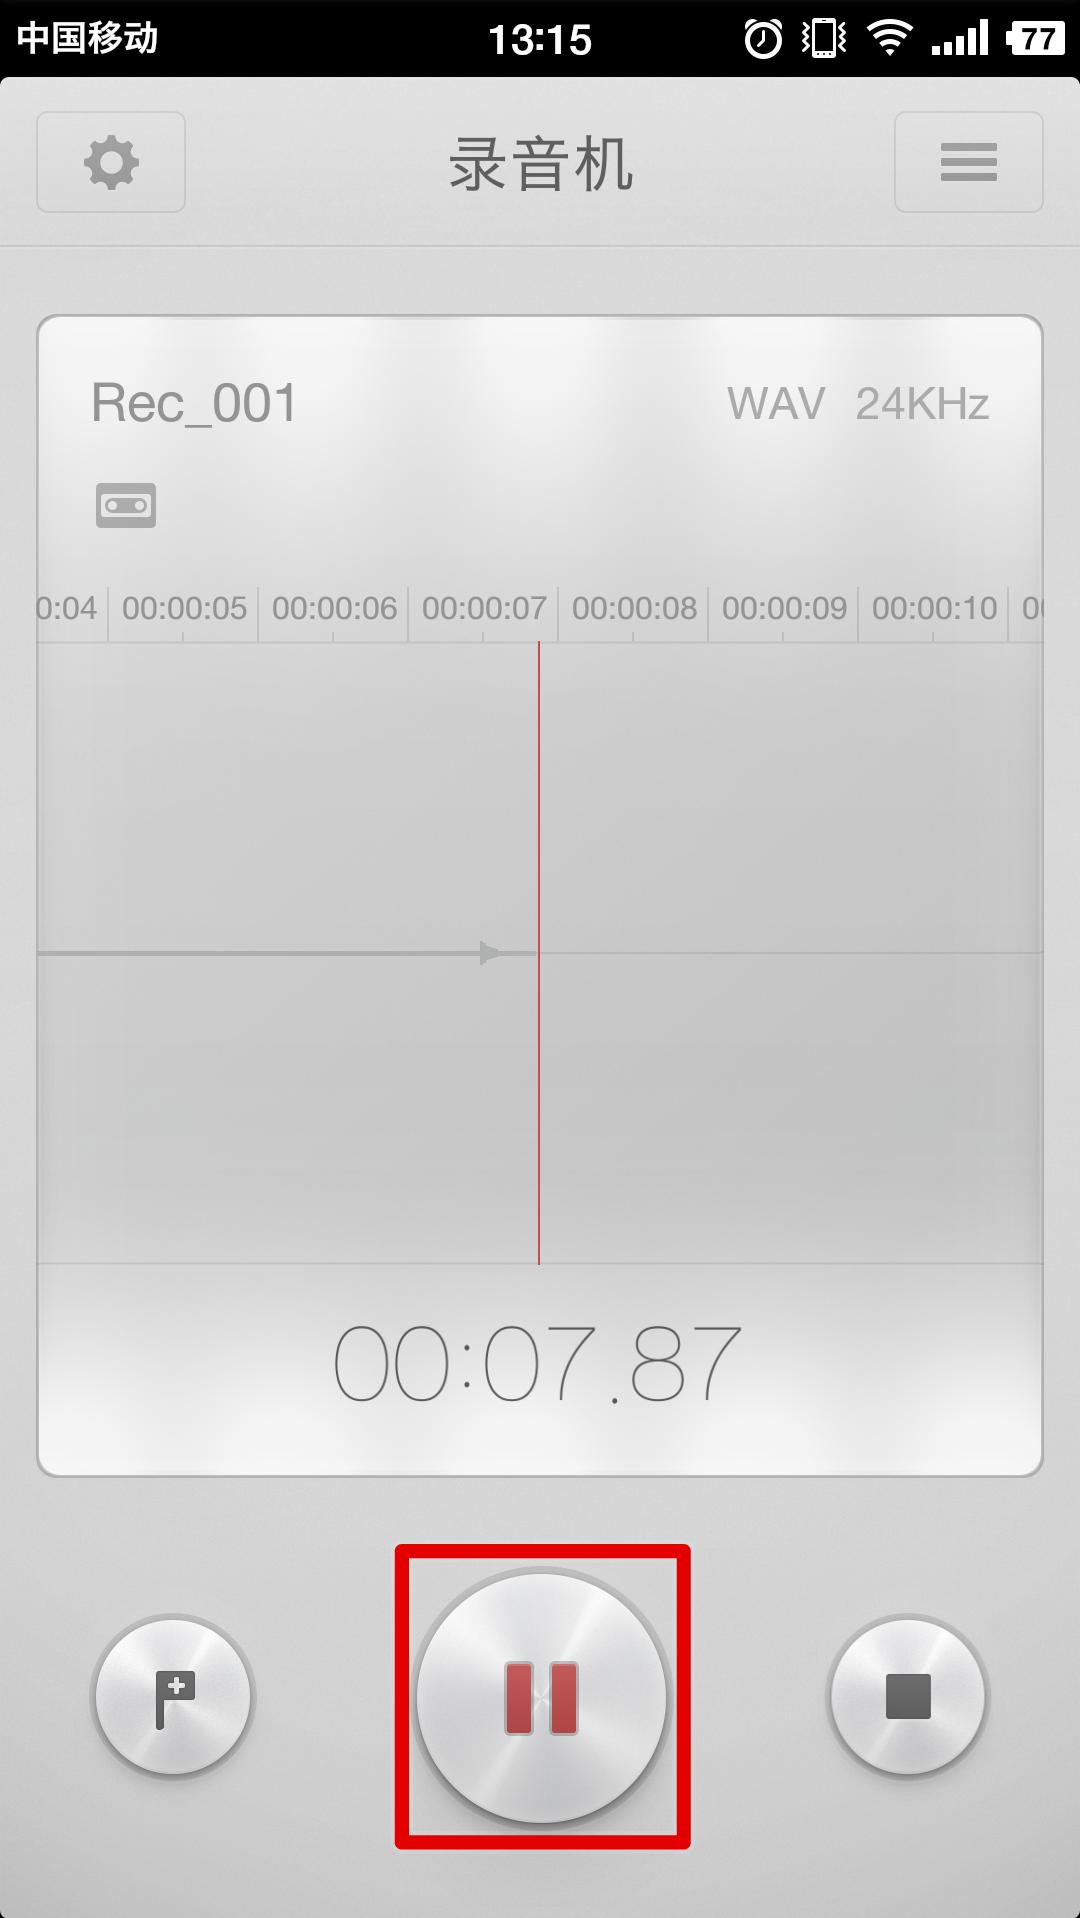 圈点_Screenshot_2015-11-04-13-15-30-259_录音机.png